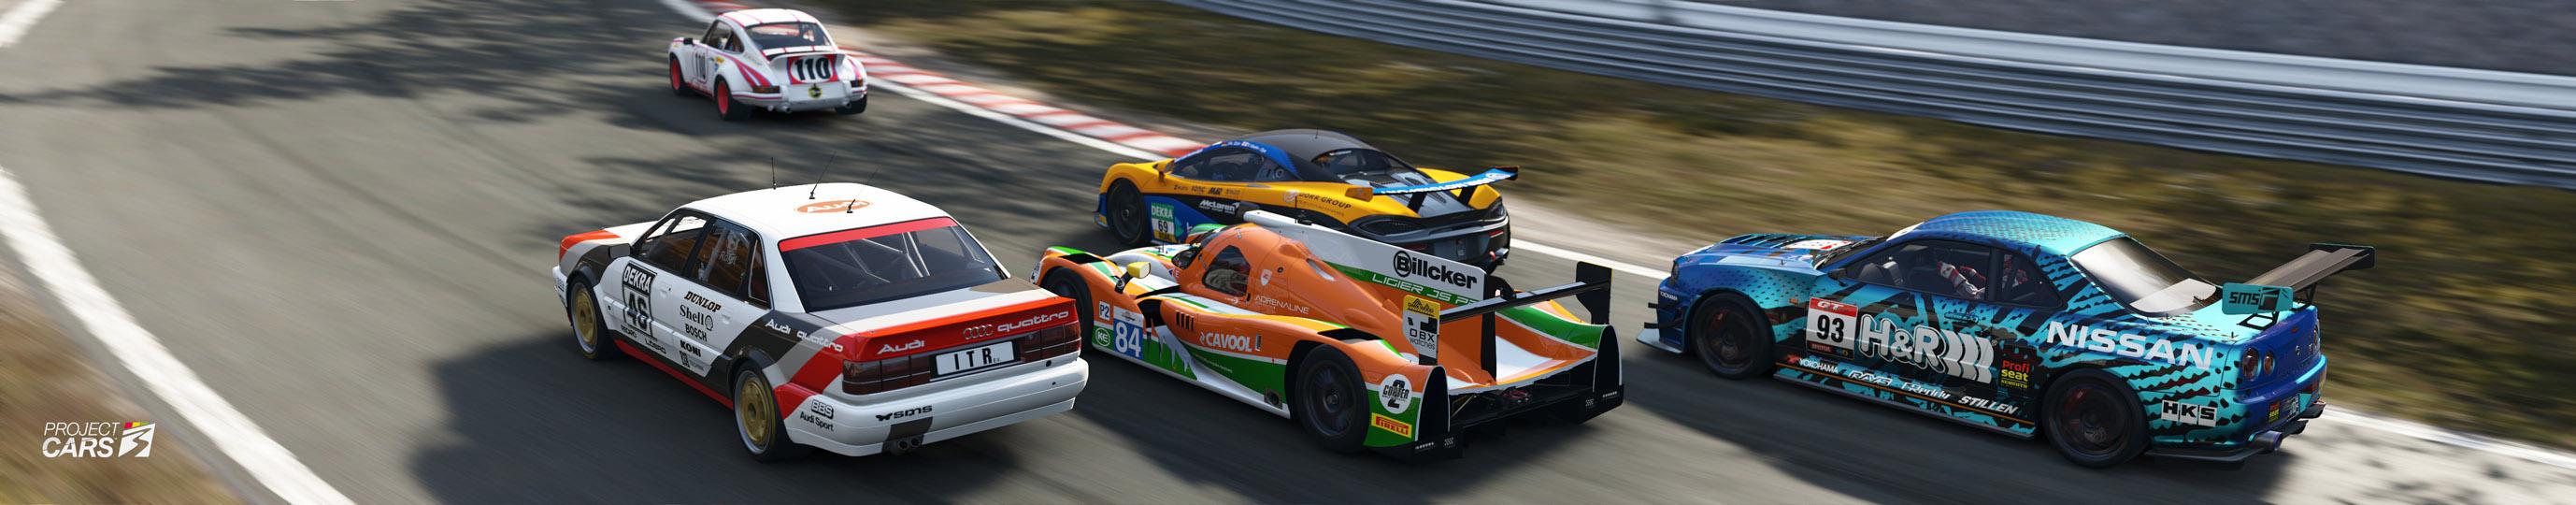 1 PROJECT CARS 3 LIGIER Multiclass at SAKITTO GP crop copy.jpg